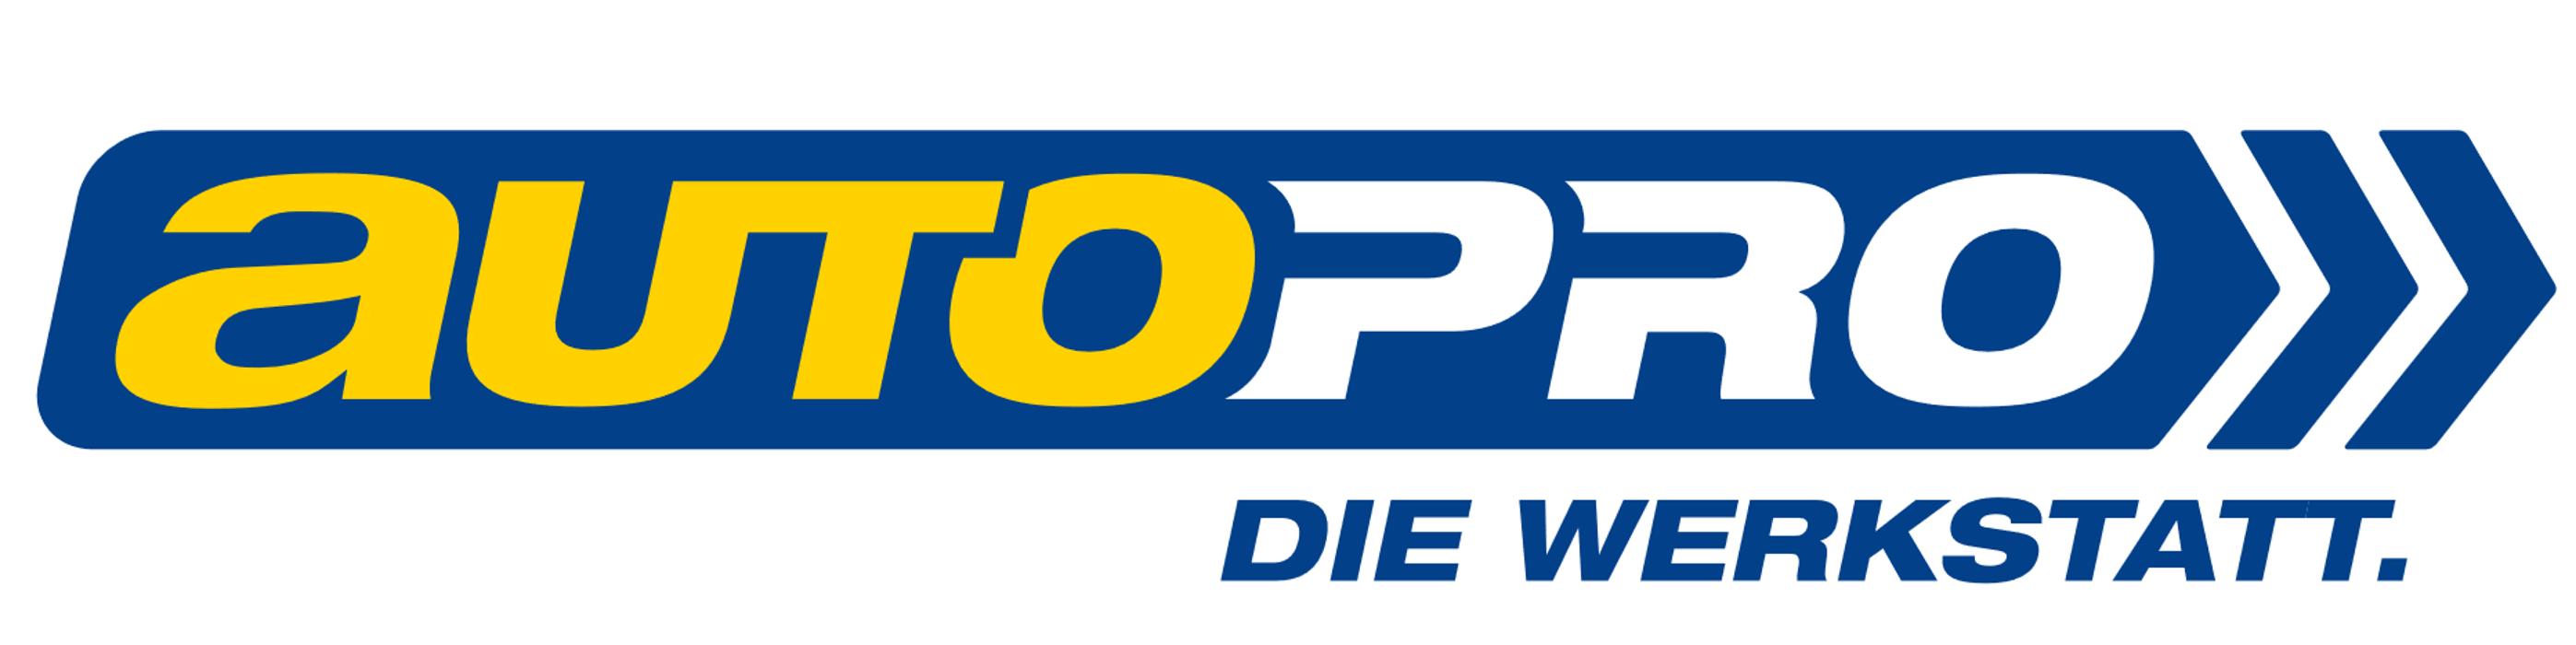 Bild zu Kfz Meisterbetrieb Merker in Kaiserslautern